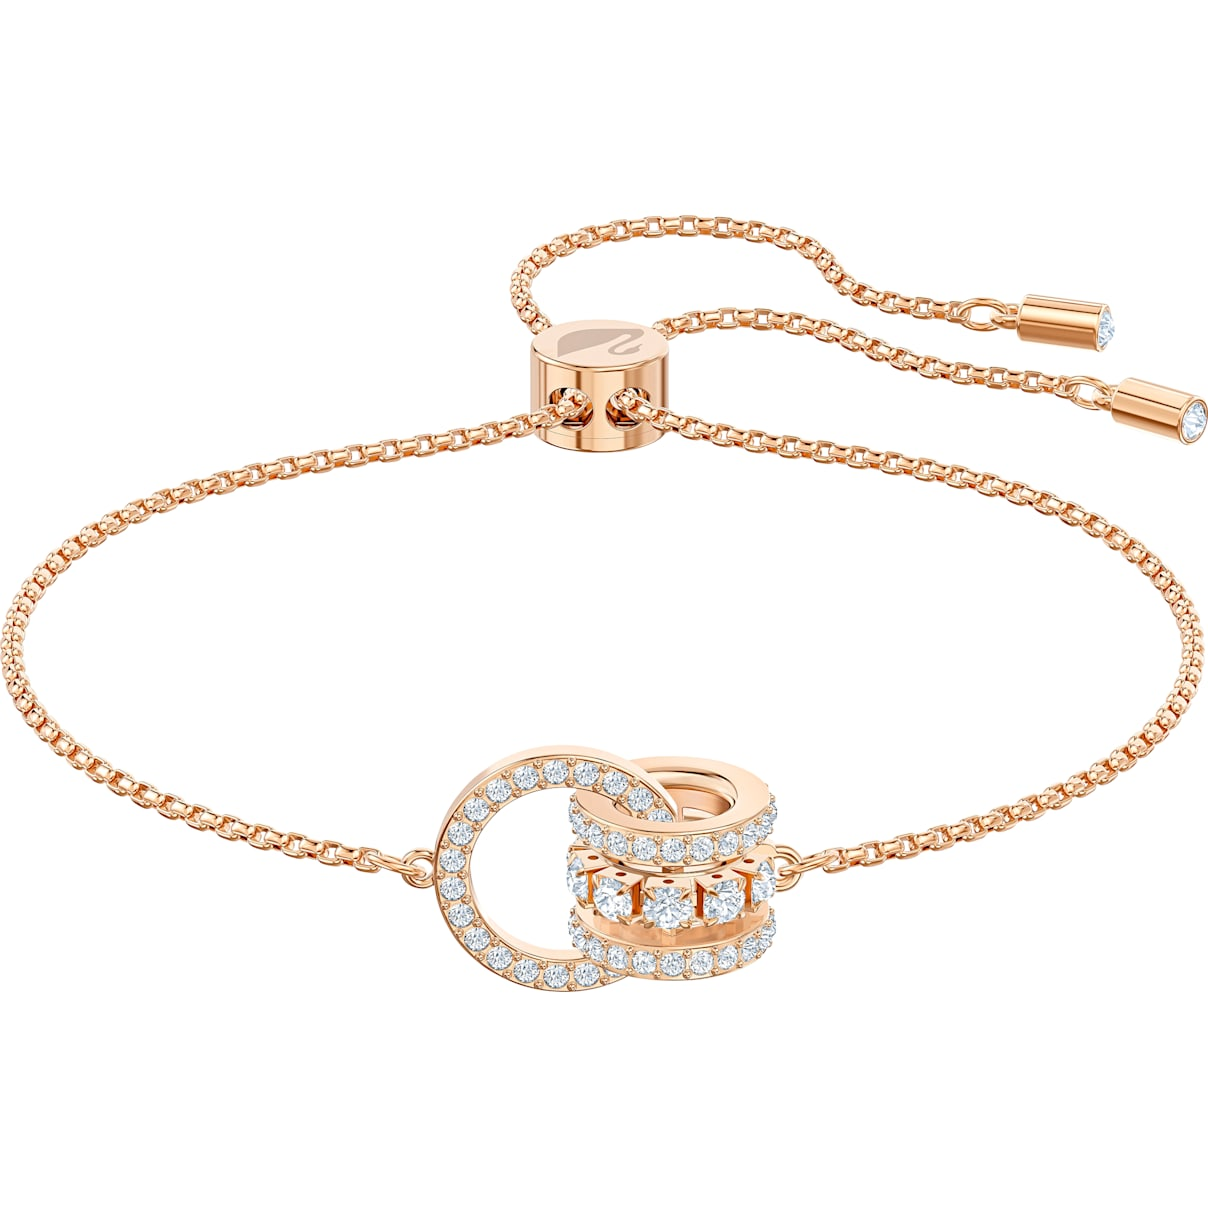 Swarovski Further Bracelet, White, Rose-gold tone plated